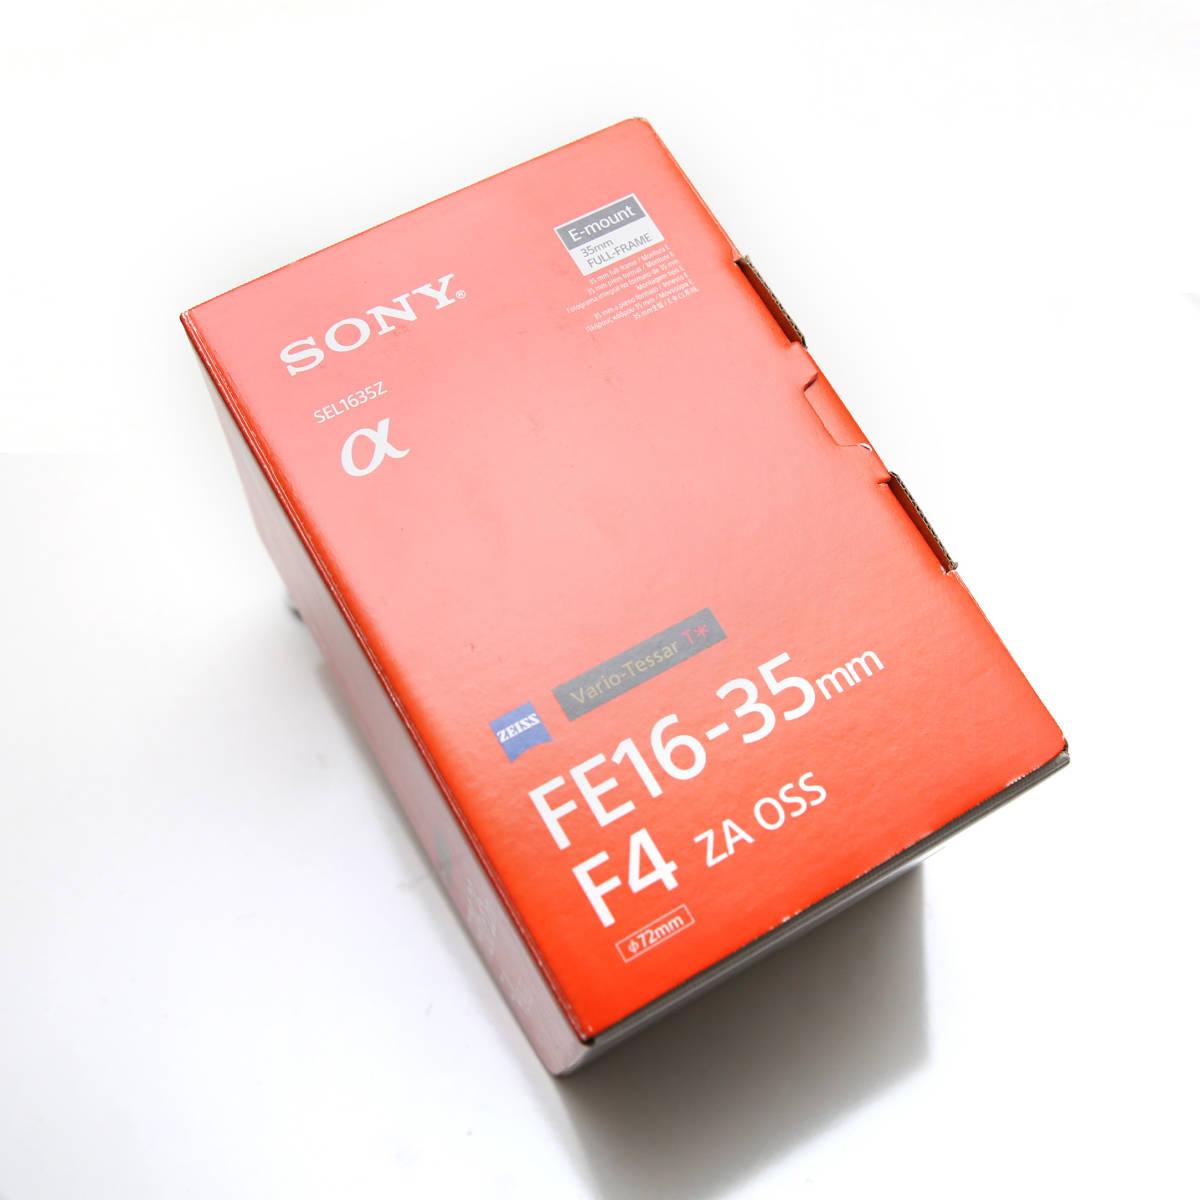 SONY 広角 Vario-Tessar T* FE 16-35mm F4 ZA OSS Eマウント35mmフルサイズ対応 SEL1635Z _画像4